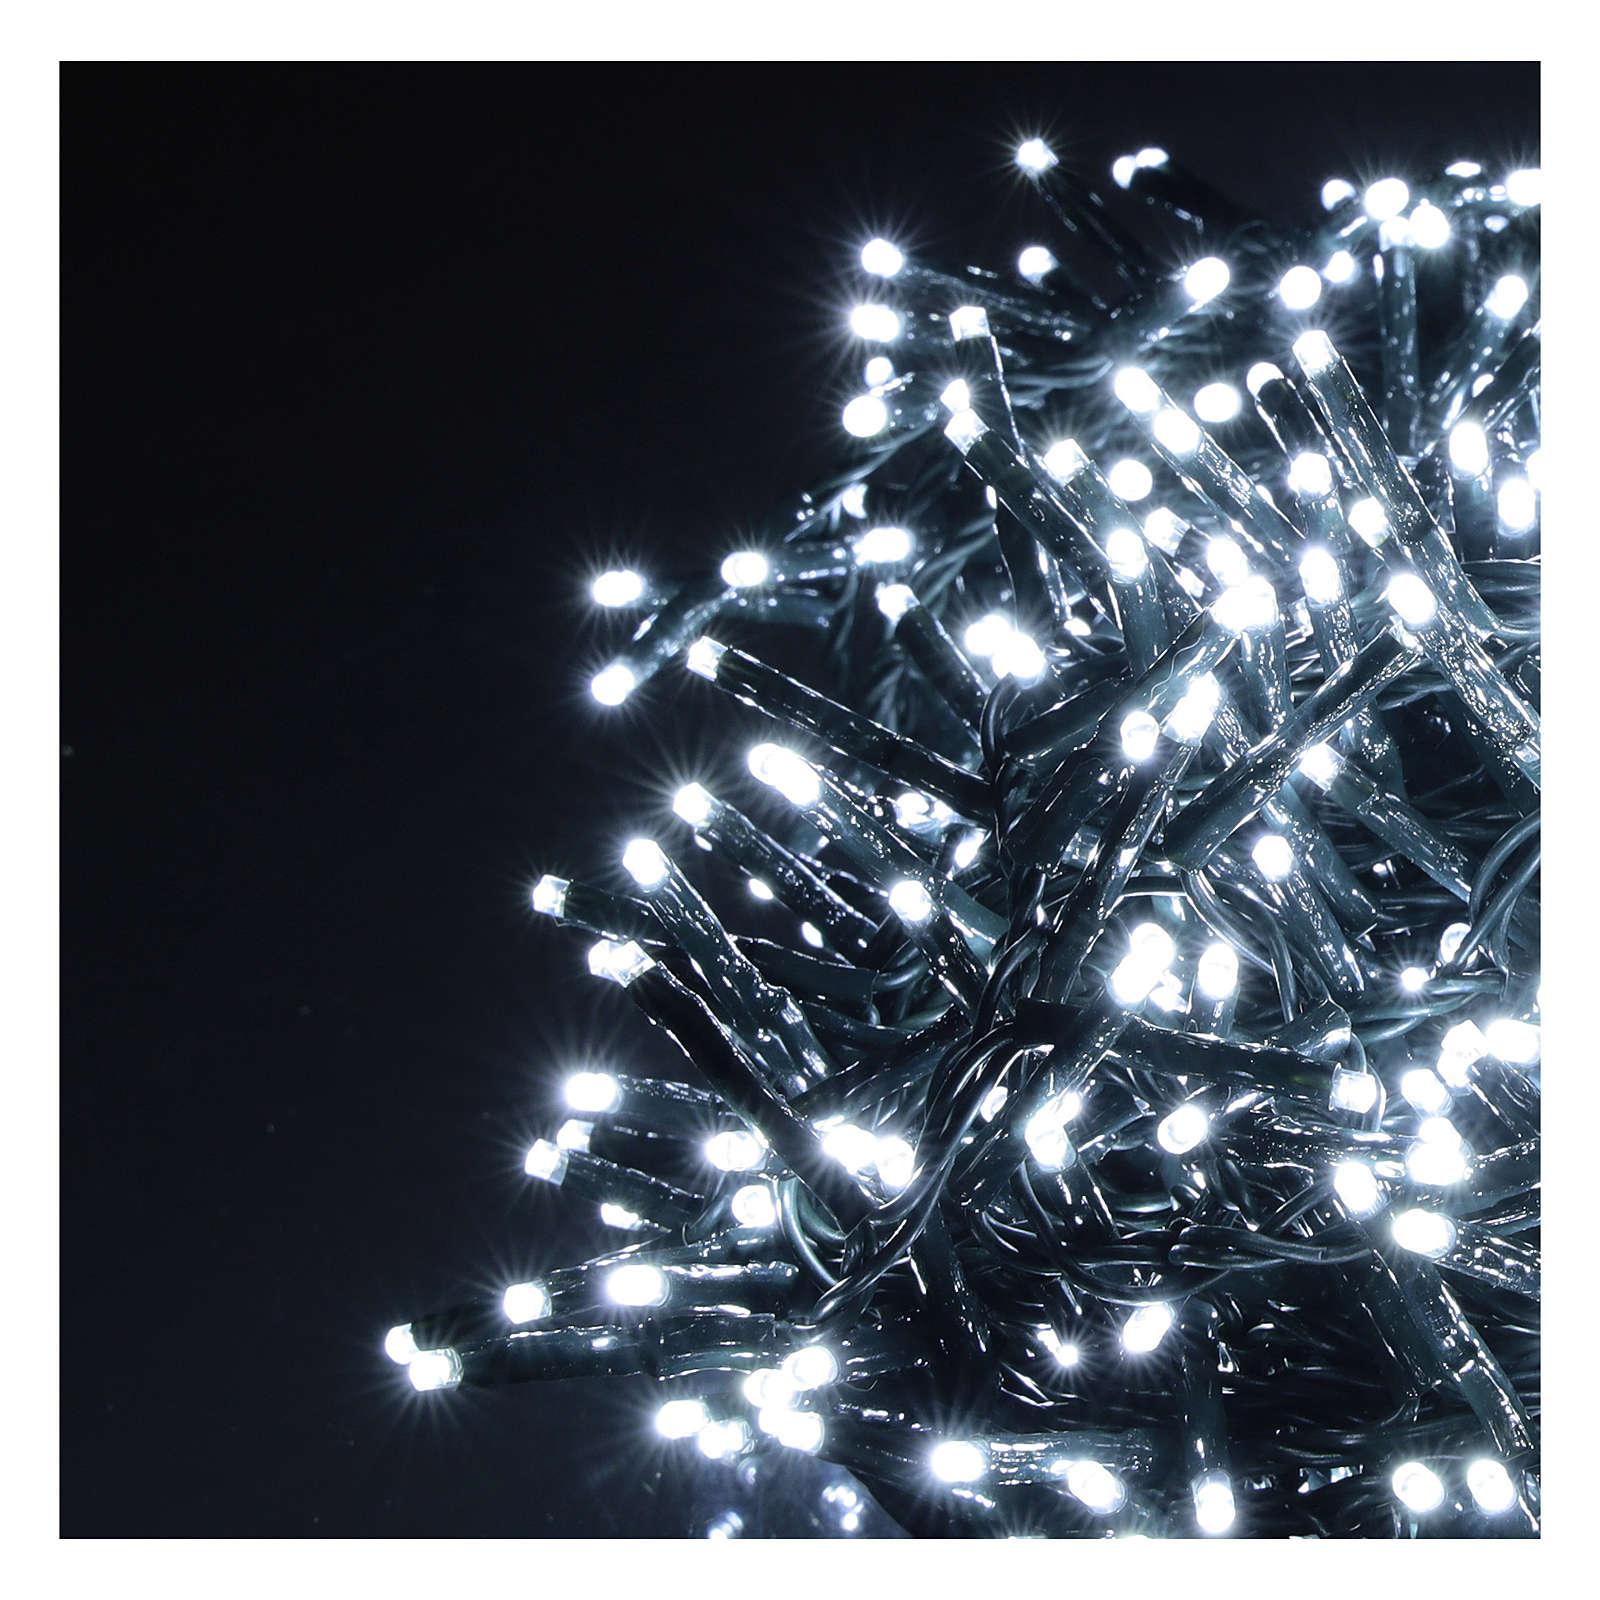 Guirlande lumineuse de Noël verte 750 LED blanc froid avec boîtier 3